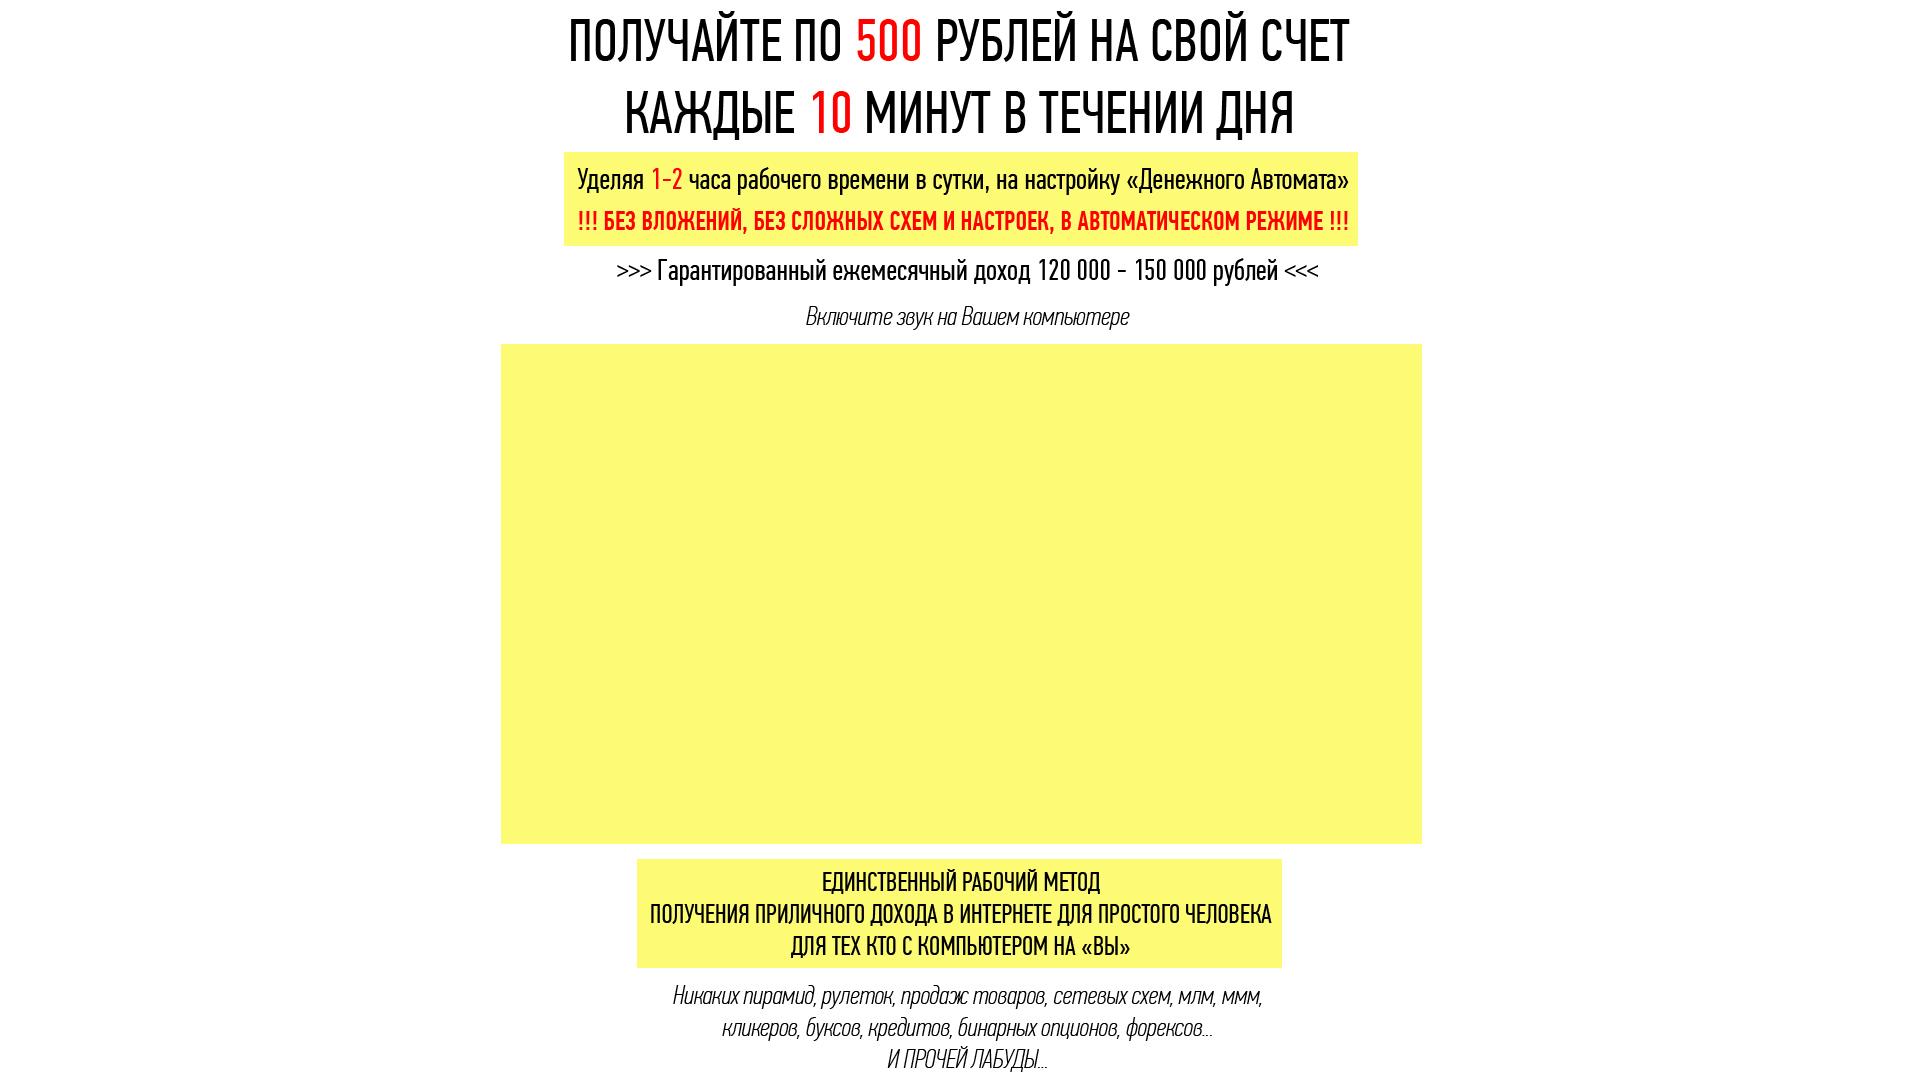 http://media.lpgenerator.ru/images/184484/verh1.jpg#size_1920x1090